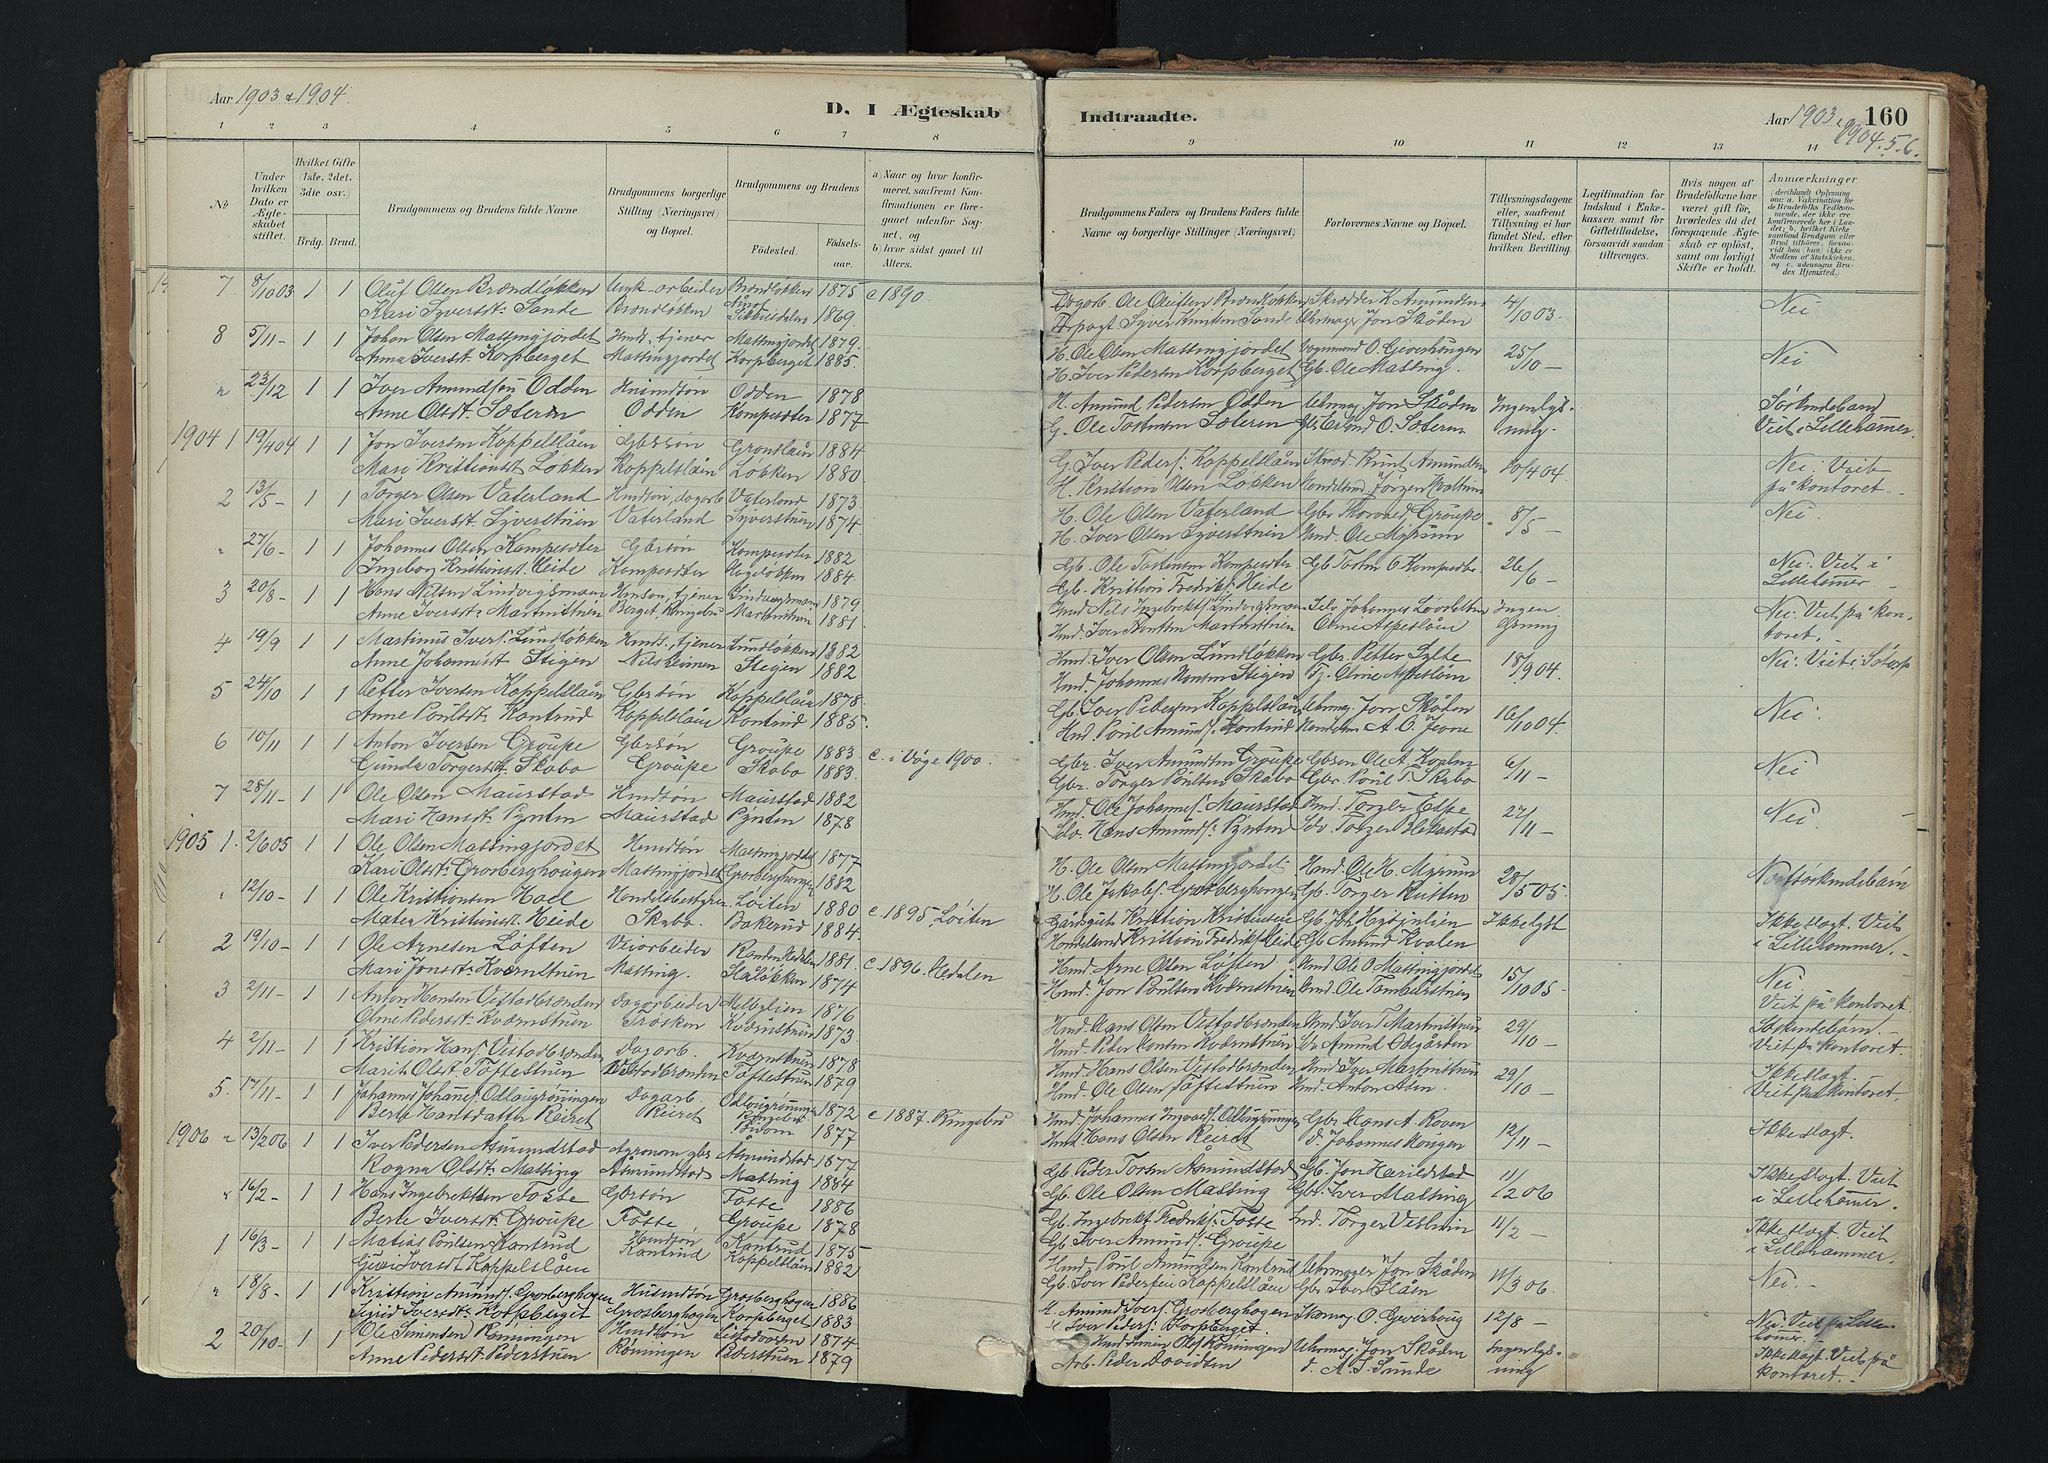 SAH, Nord-Fron prestekontor, Ministerialbok nr. 5, 1884-1914, s. 160